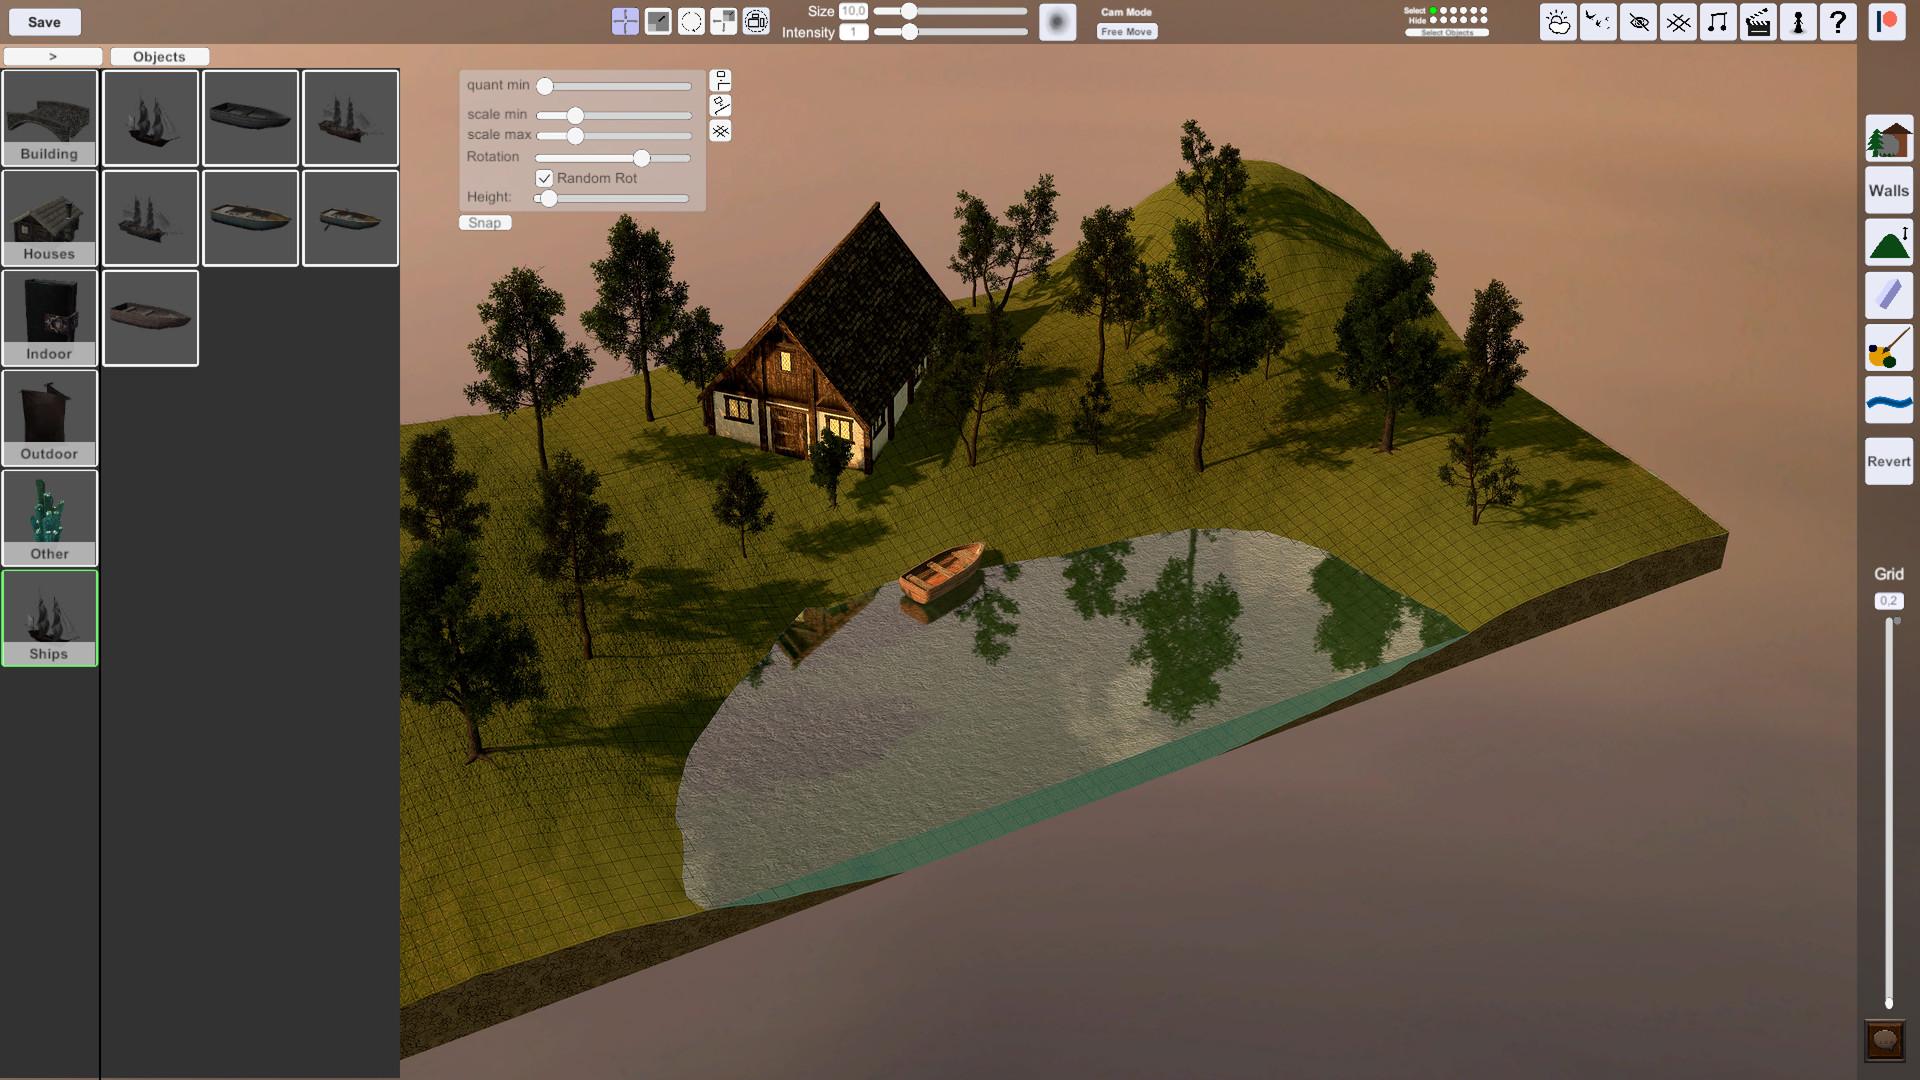 Wildshape   Map Editor + VTT on Steam